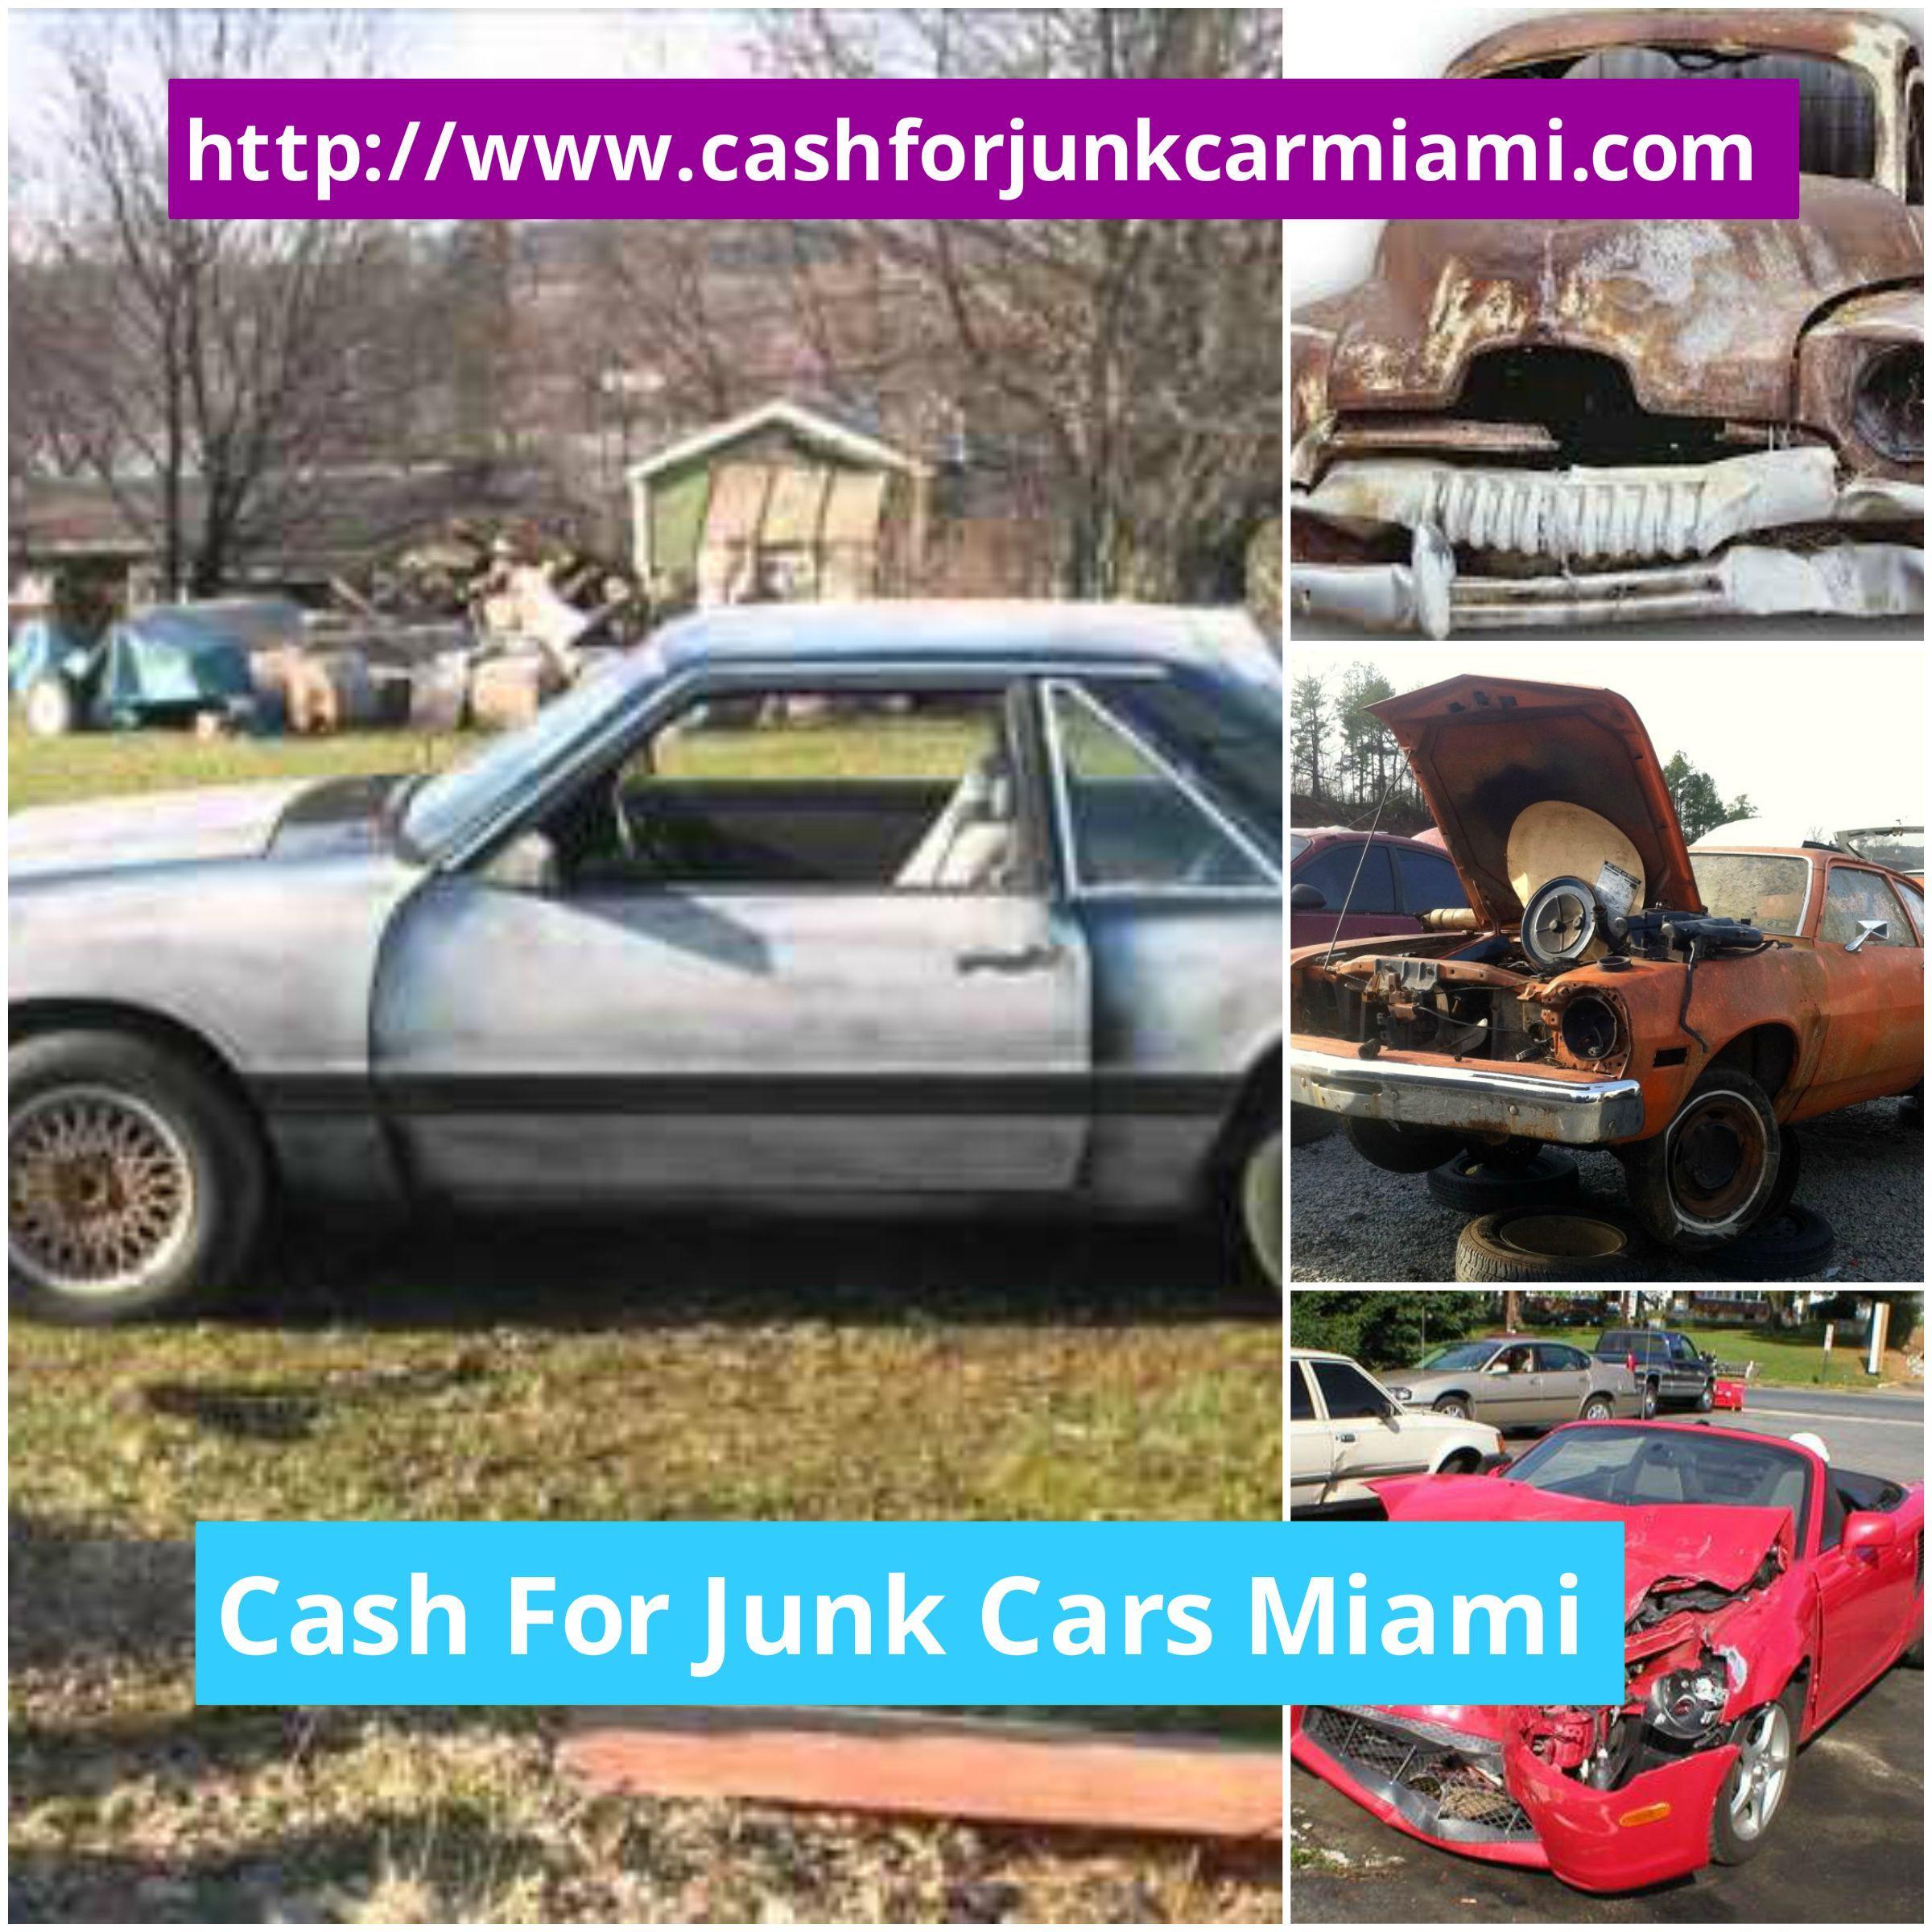 http://www.cashforjunkcarmiami.com Cash for Junk Cars in Miami ...